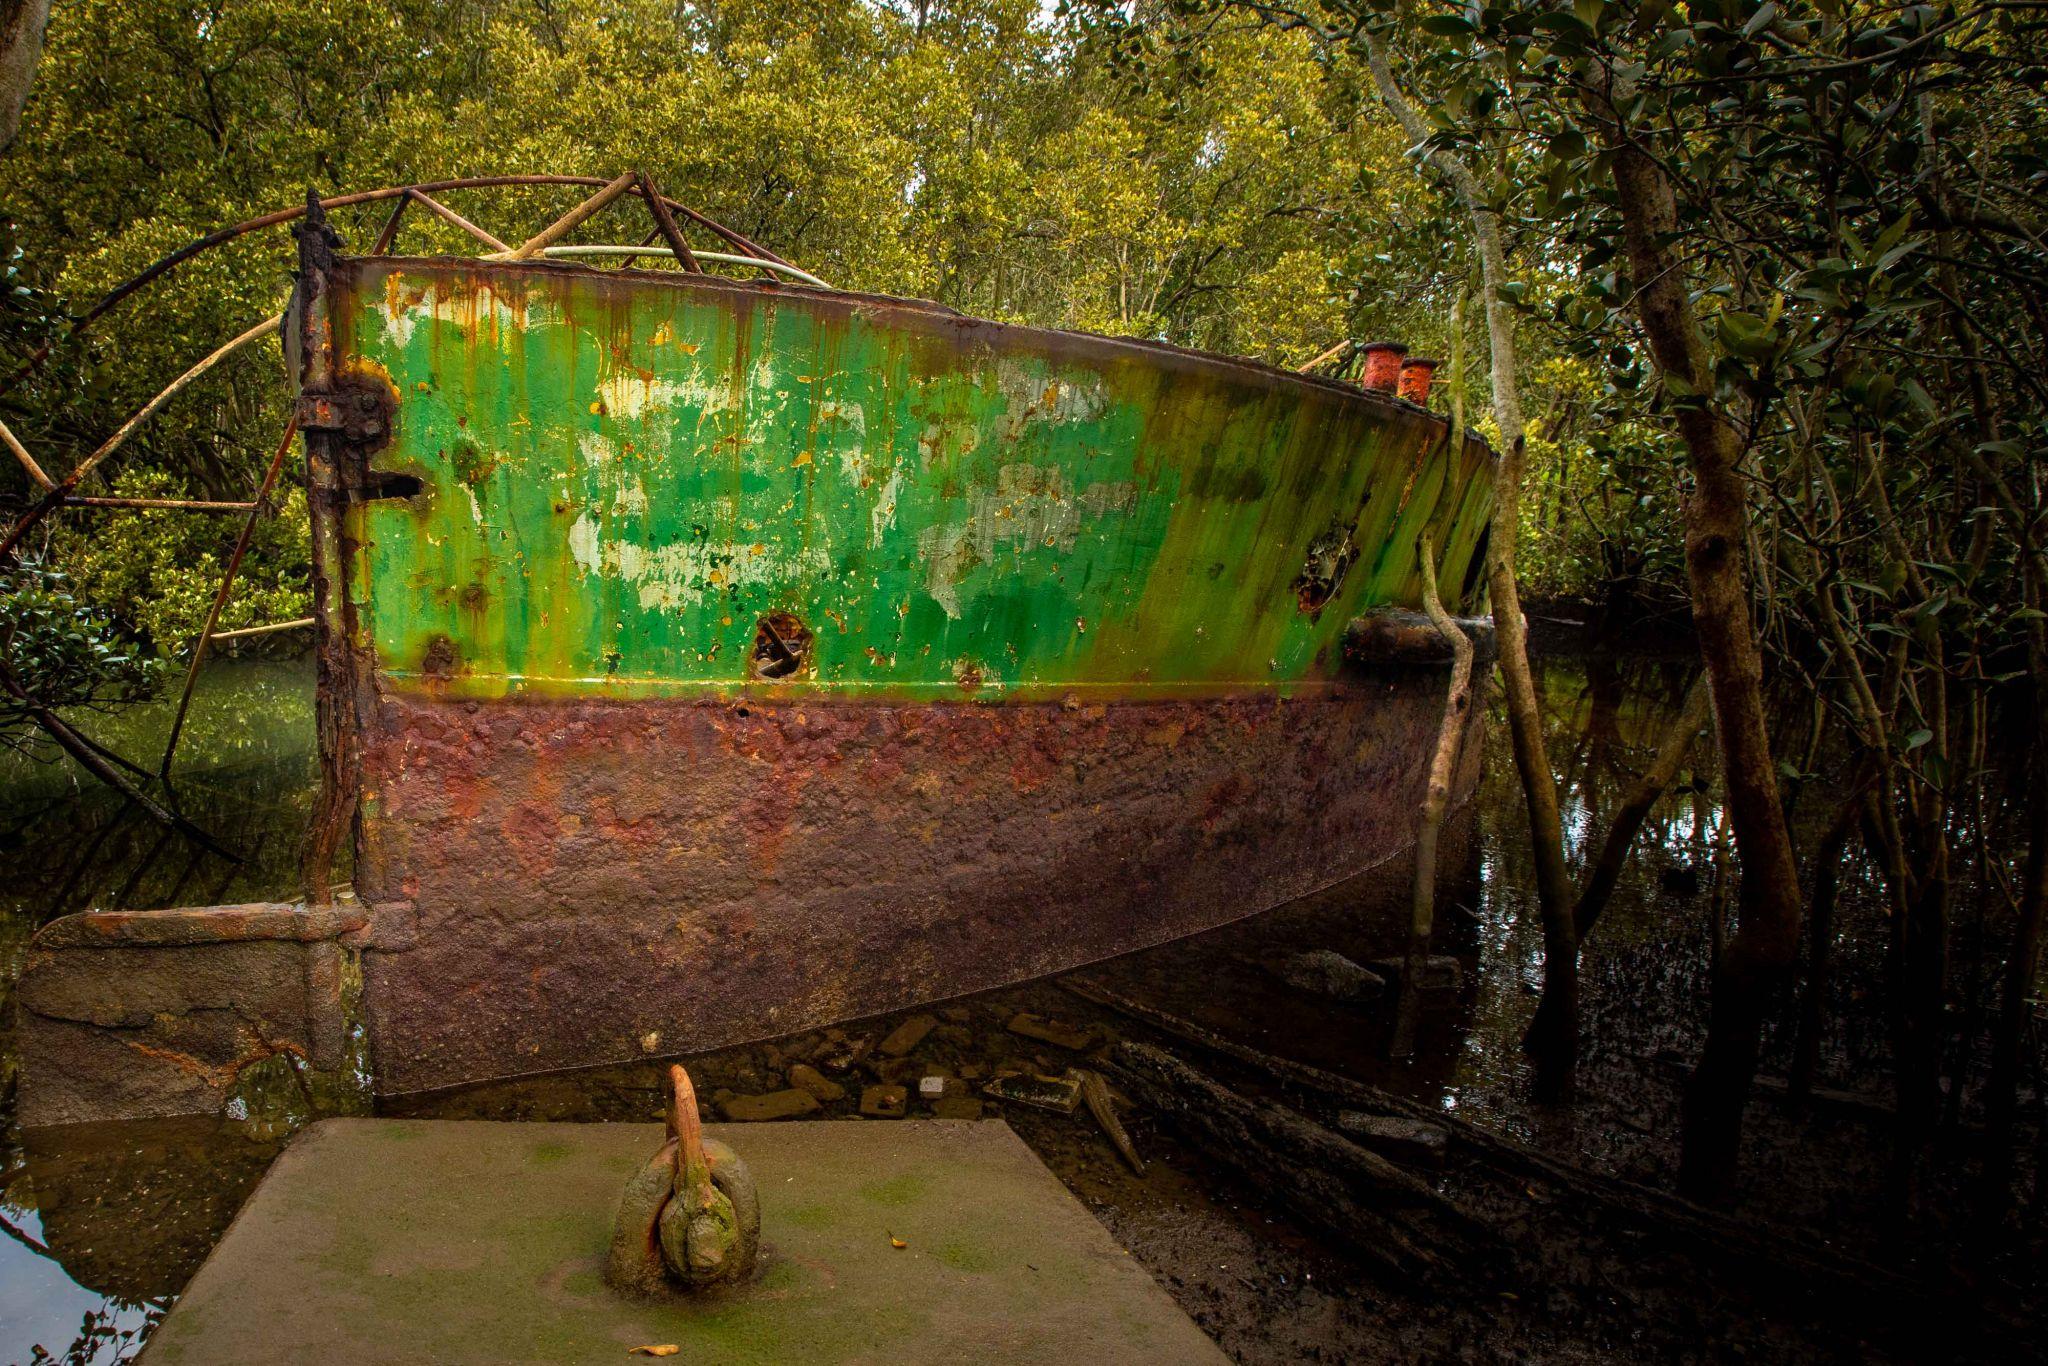 -SS Heroic Shipwreck Homebush New South Wales, Australia